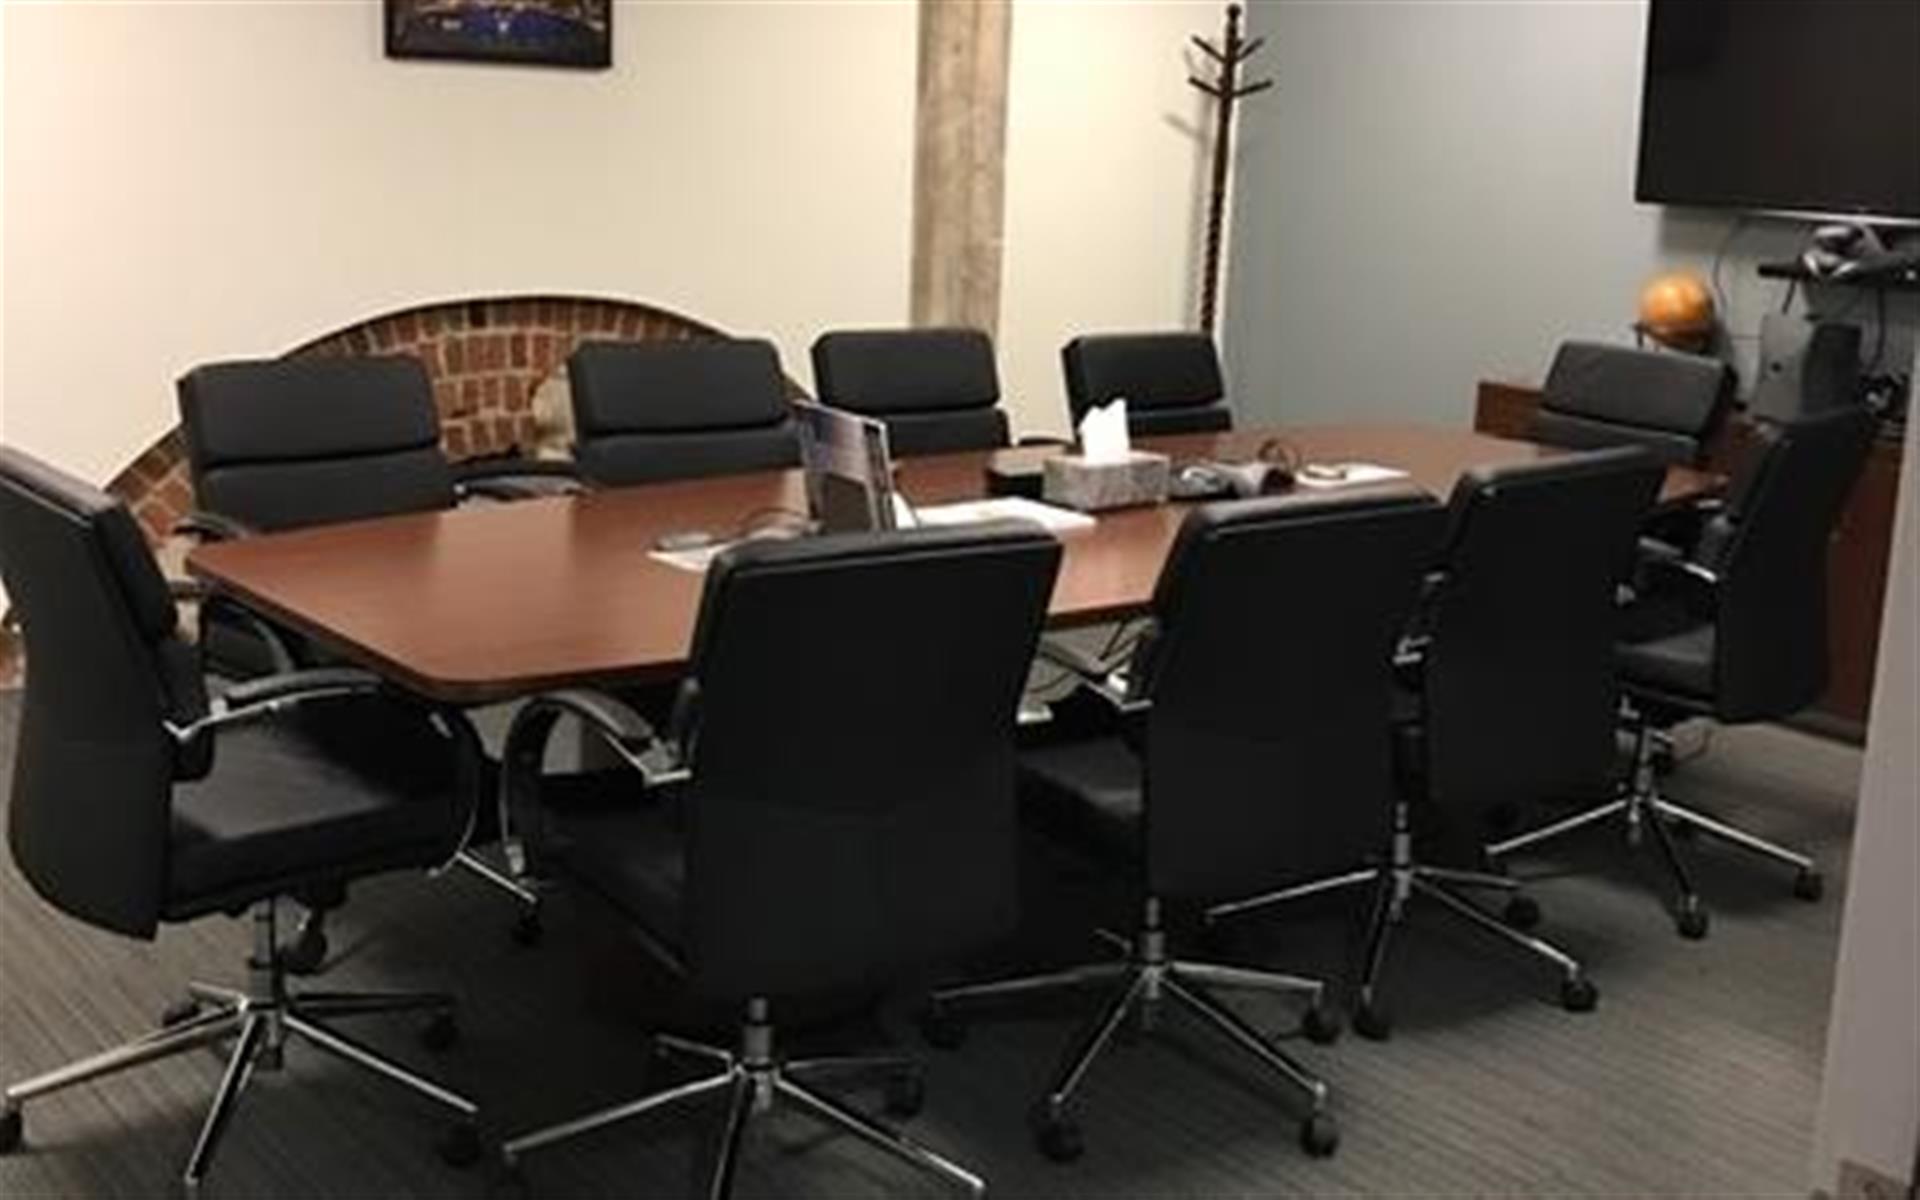 PacMutual Bldg. - First Legal Deposition - VTC Room